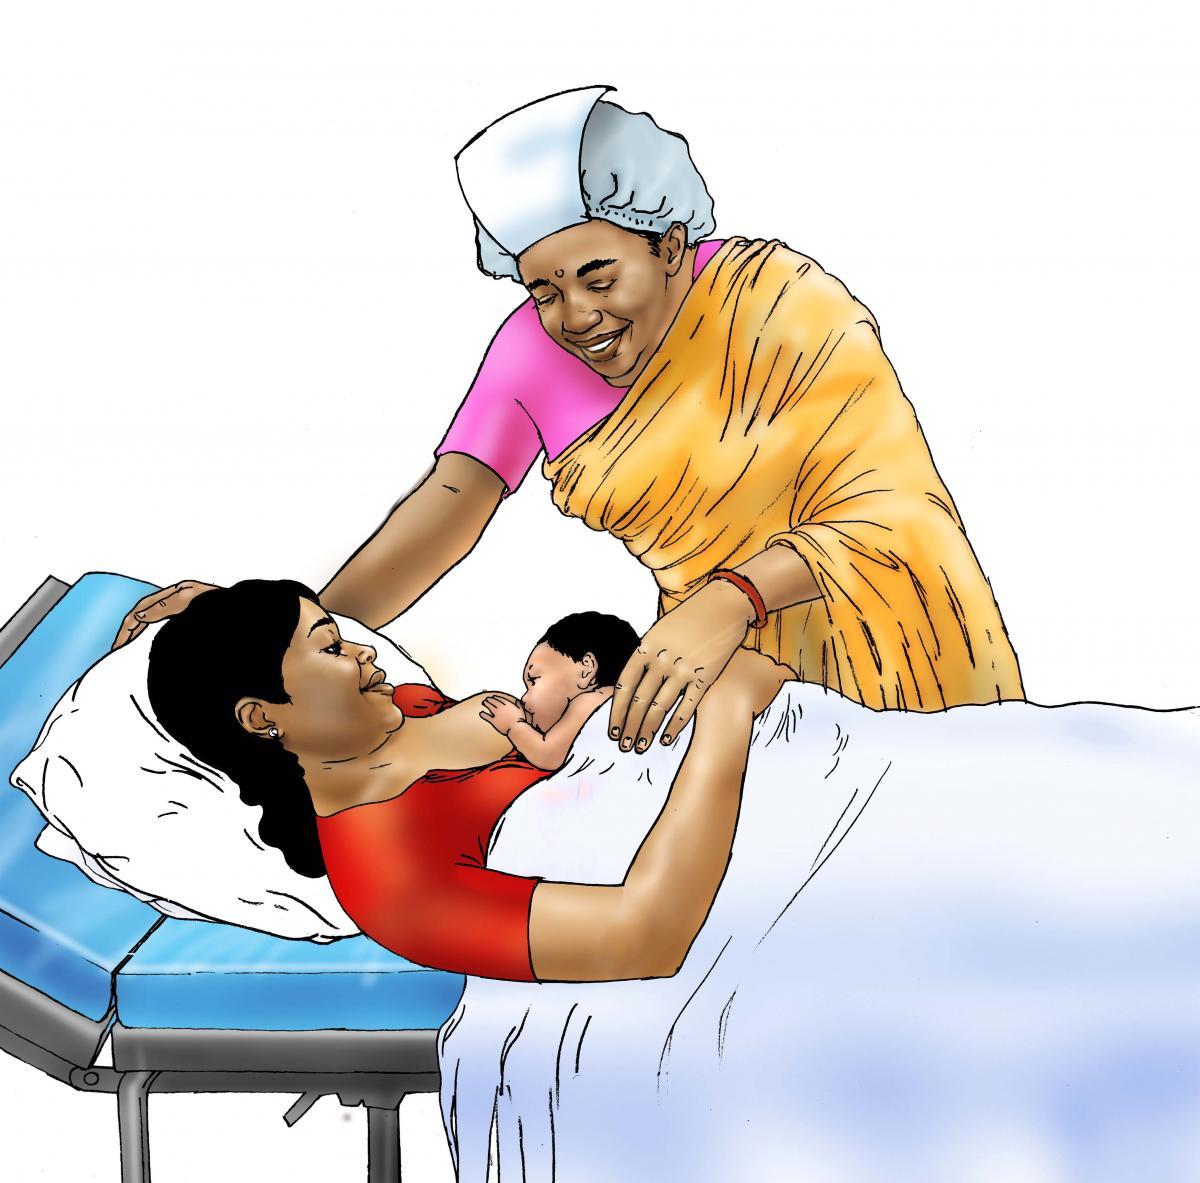 Breastfeeding - Early initiation of breastfeeding 0-6 mo - 02 - India